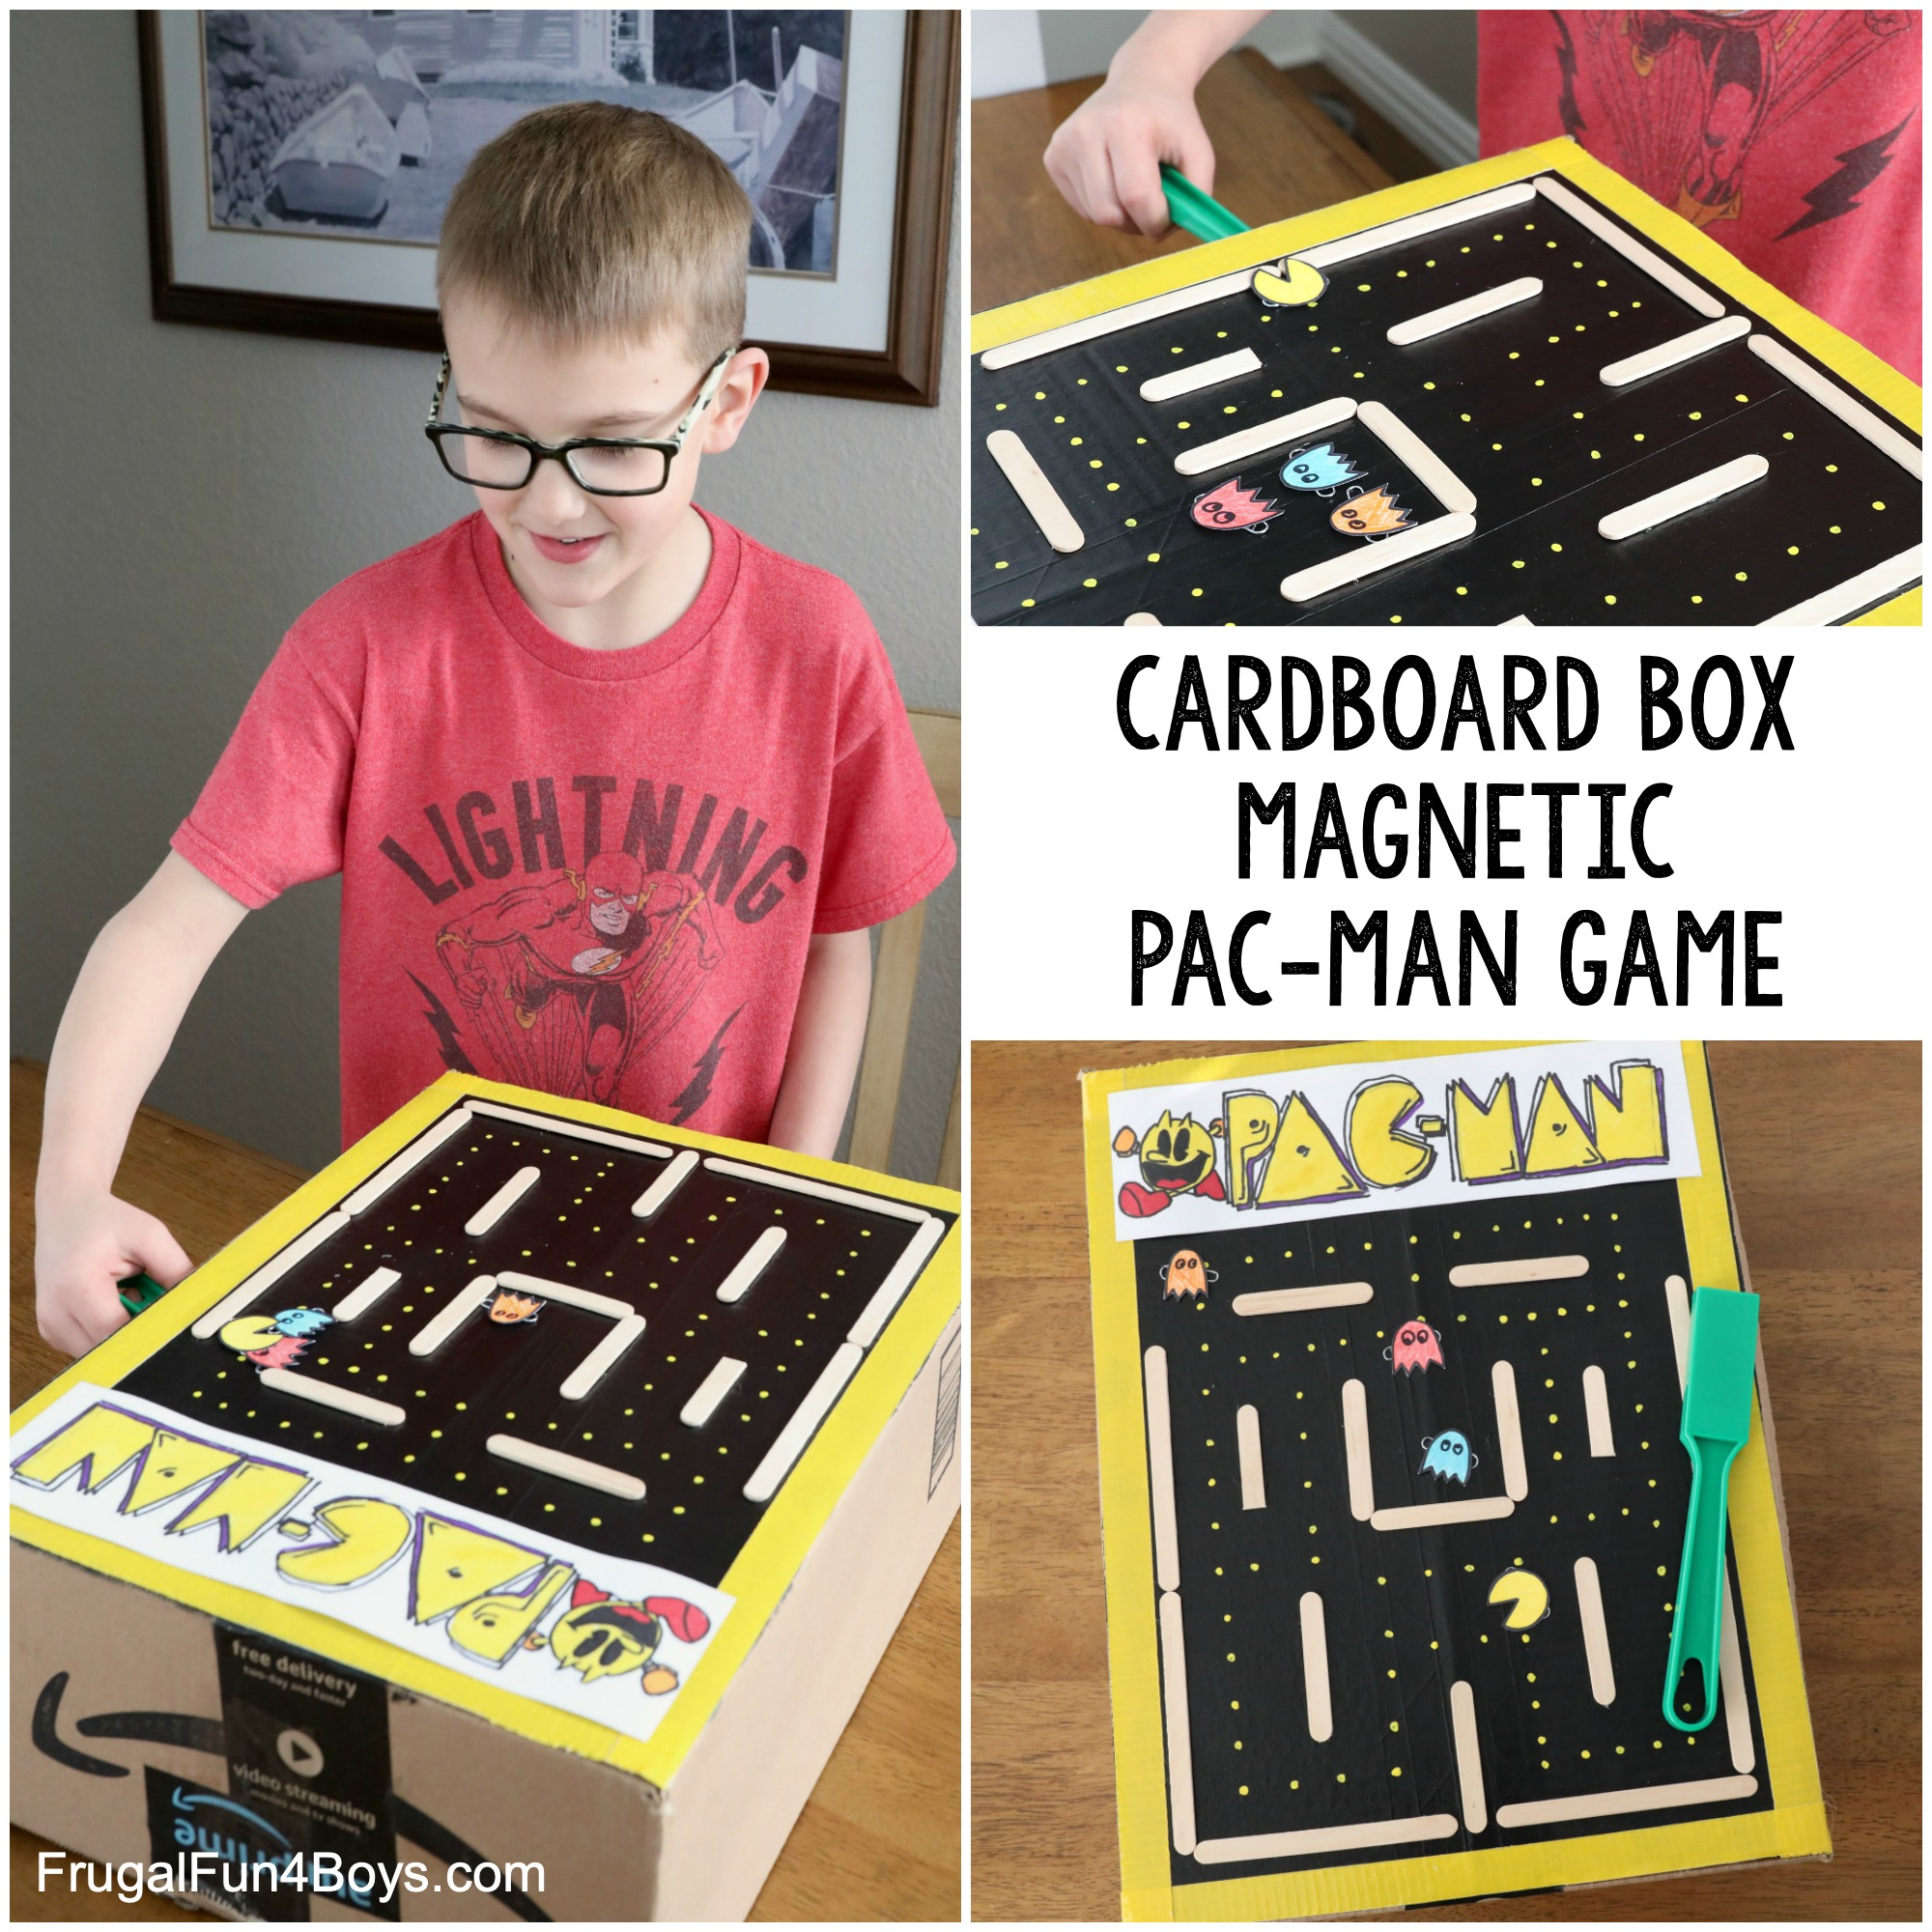 Cardboard Box Pac-Man Game